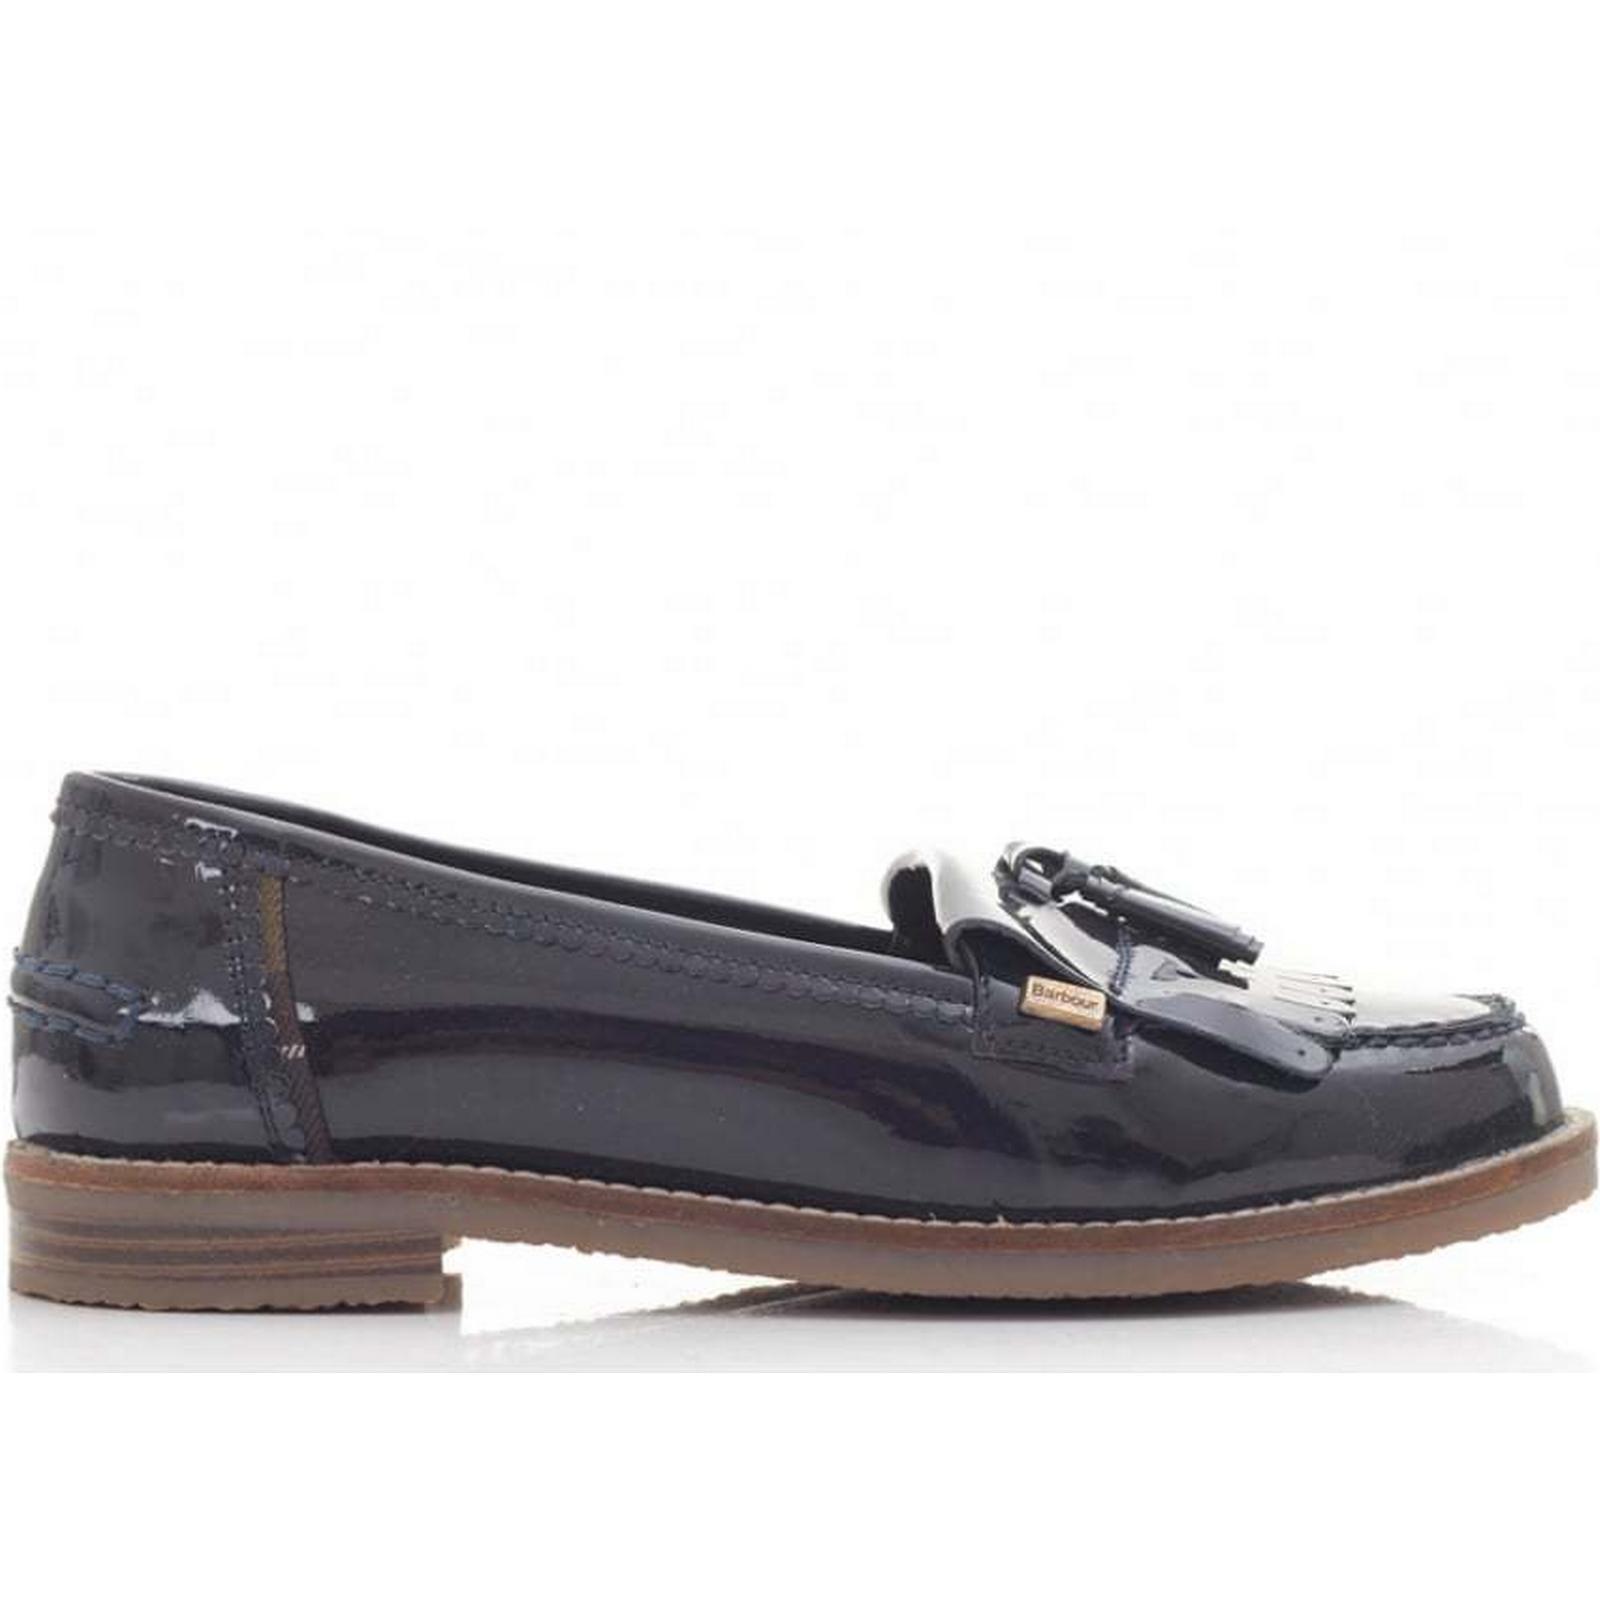 Barbour Naomi Patent Loafers Colour: 6 NAVY, Size: 6 Colour: 1219ff